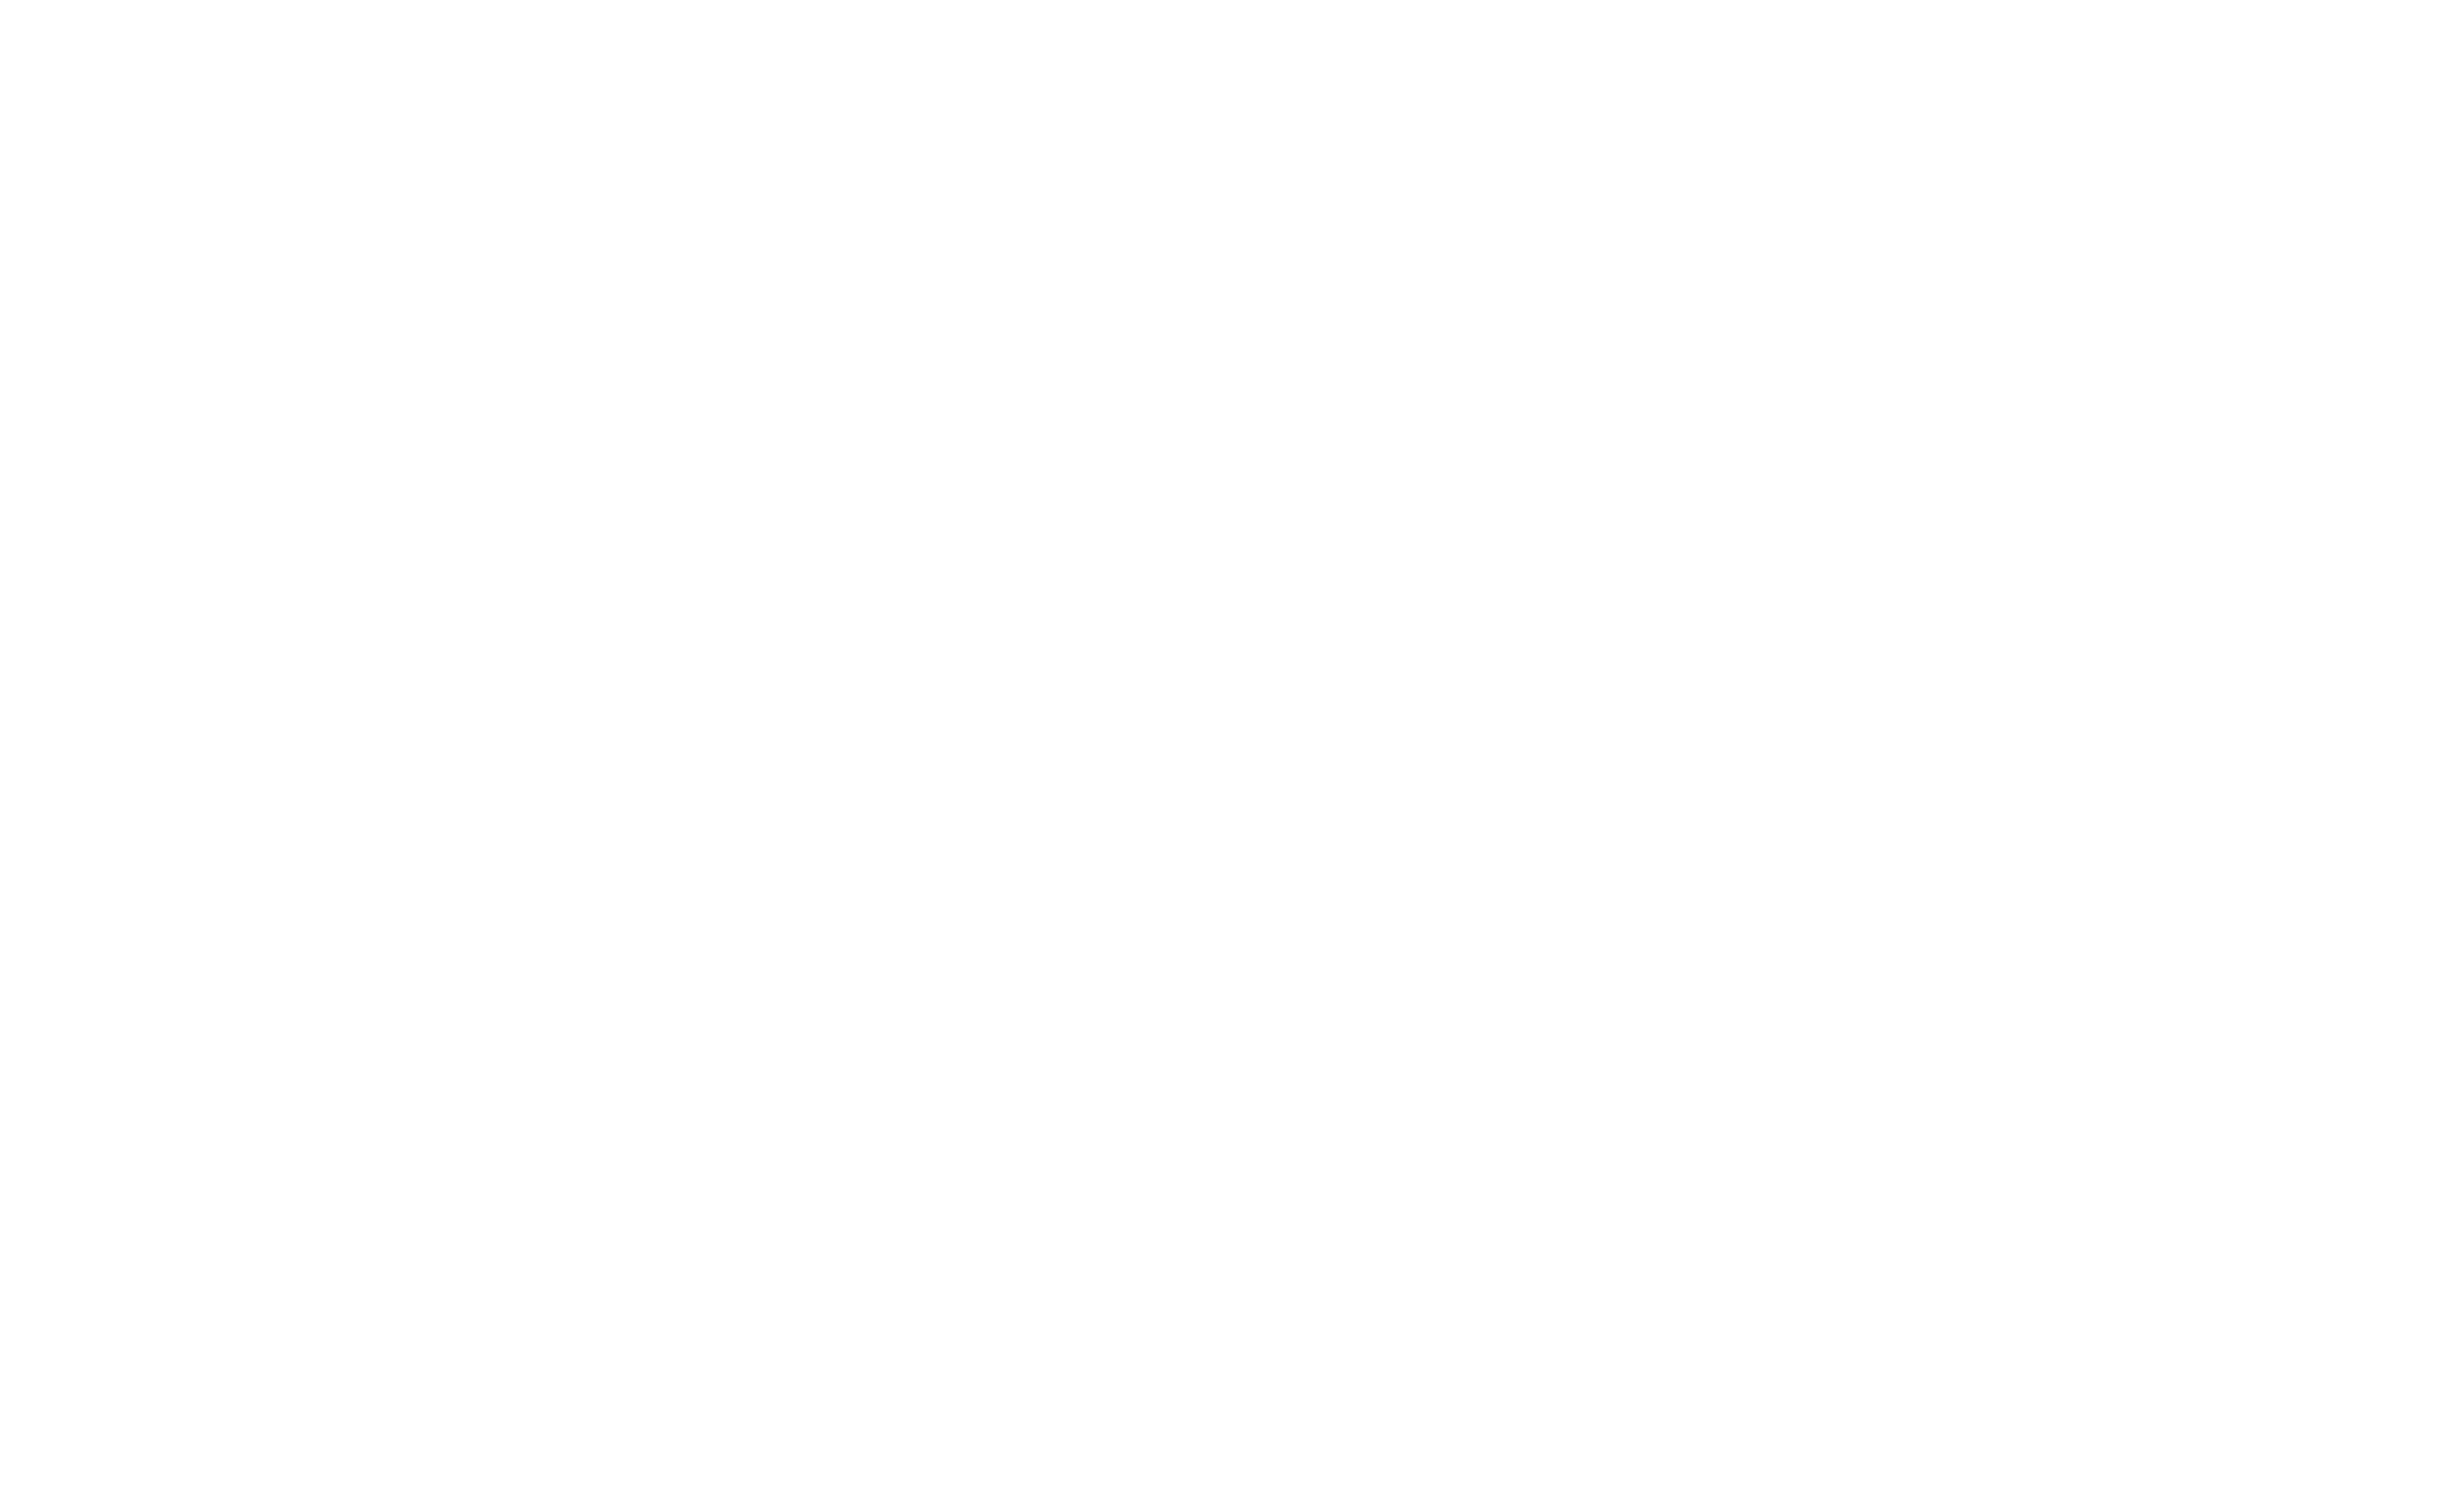 SimposioLogo